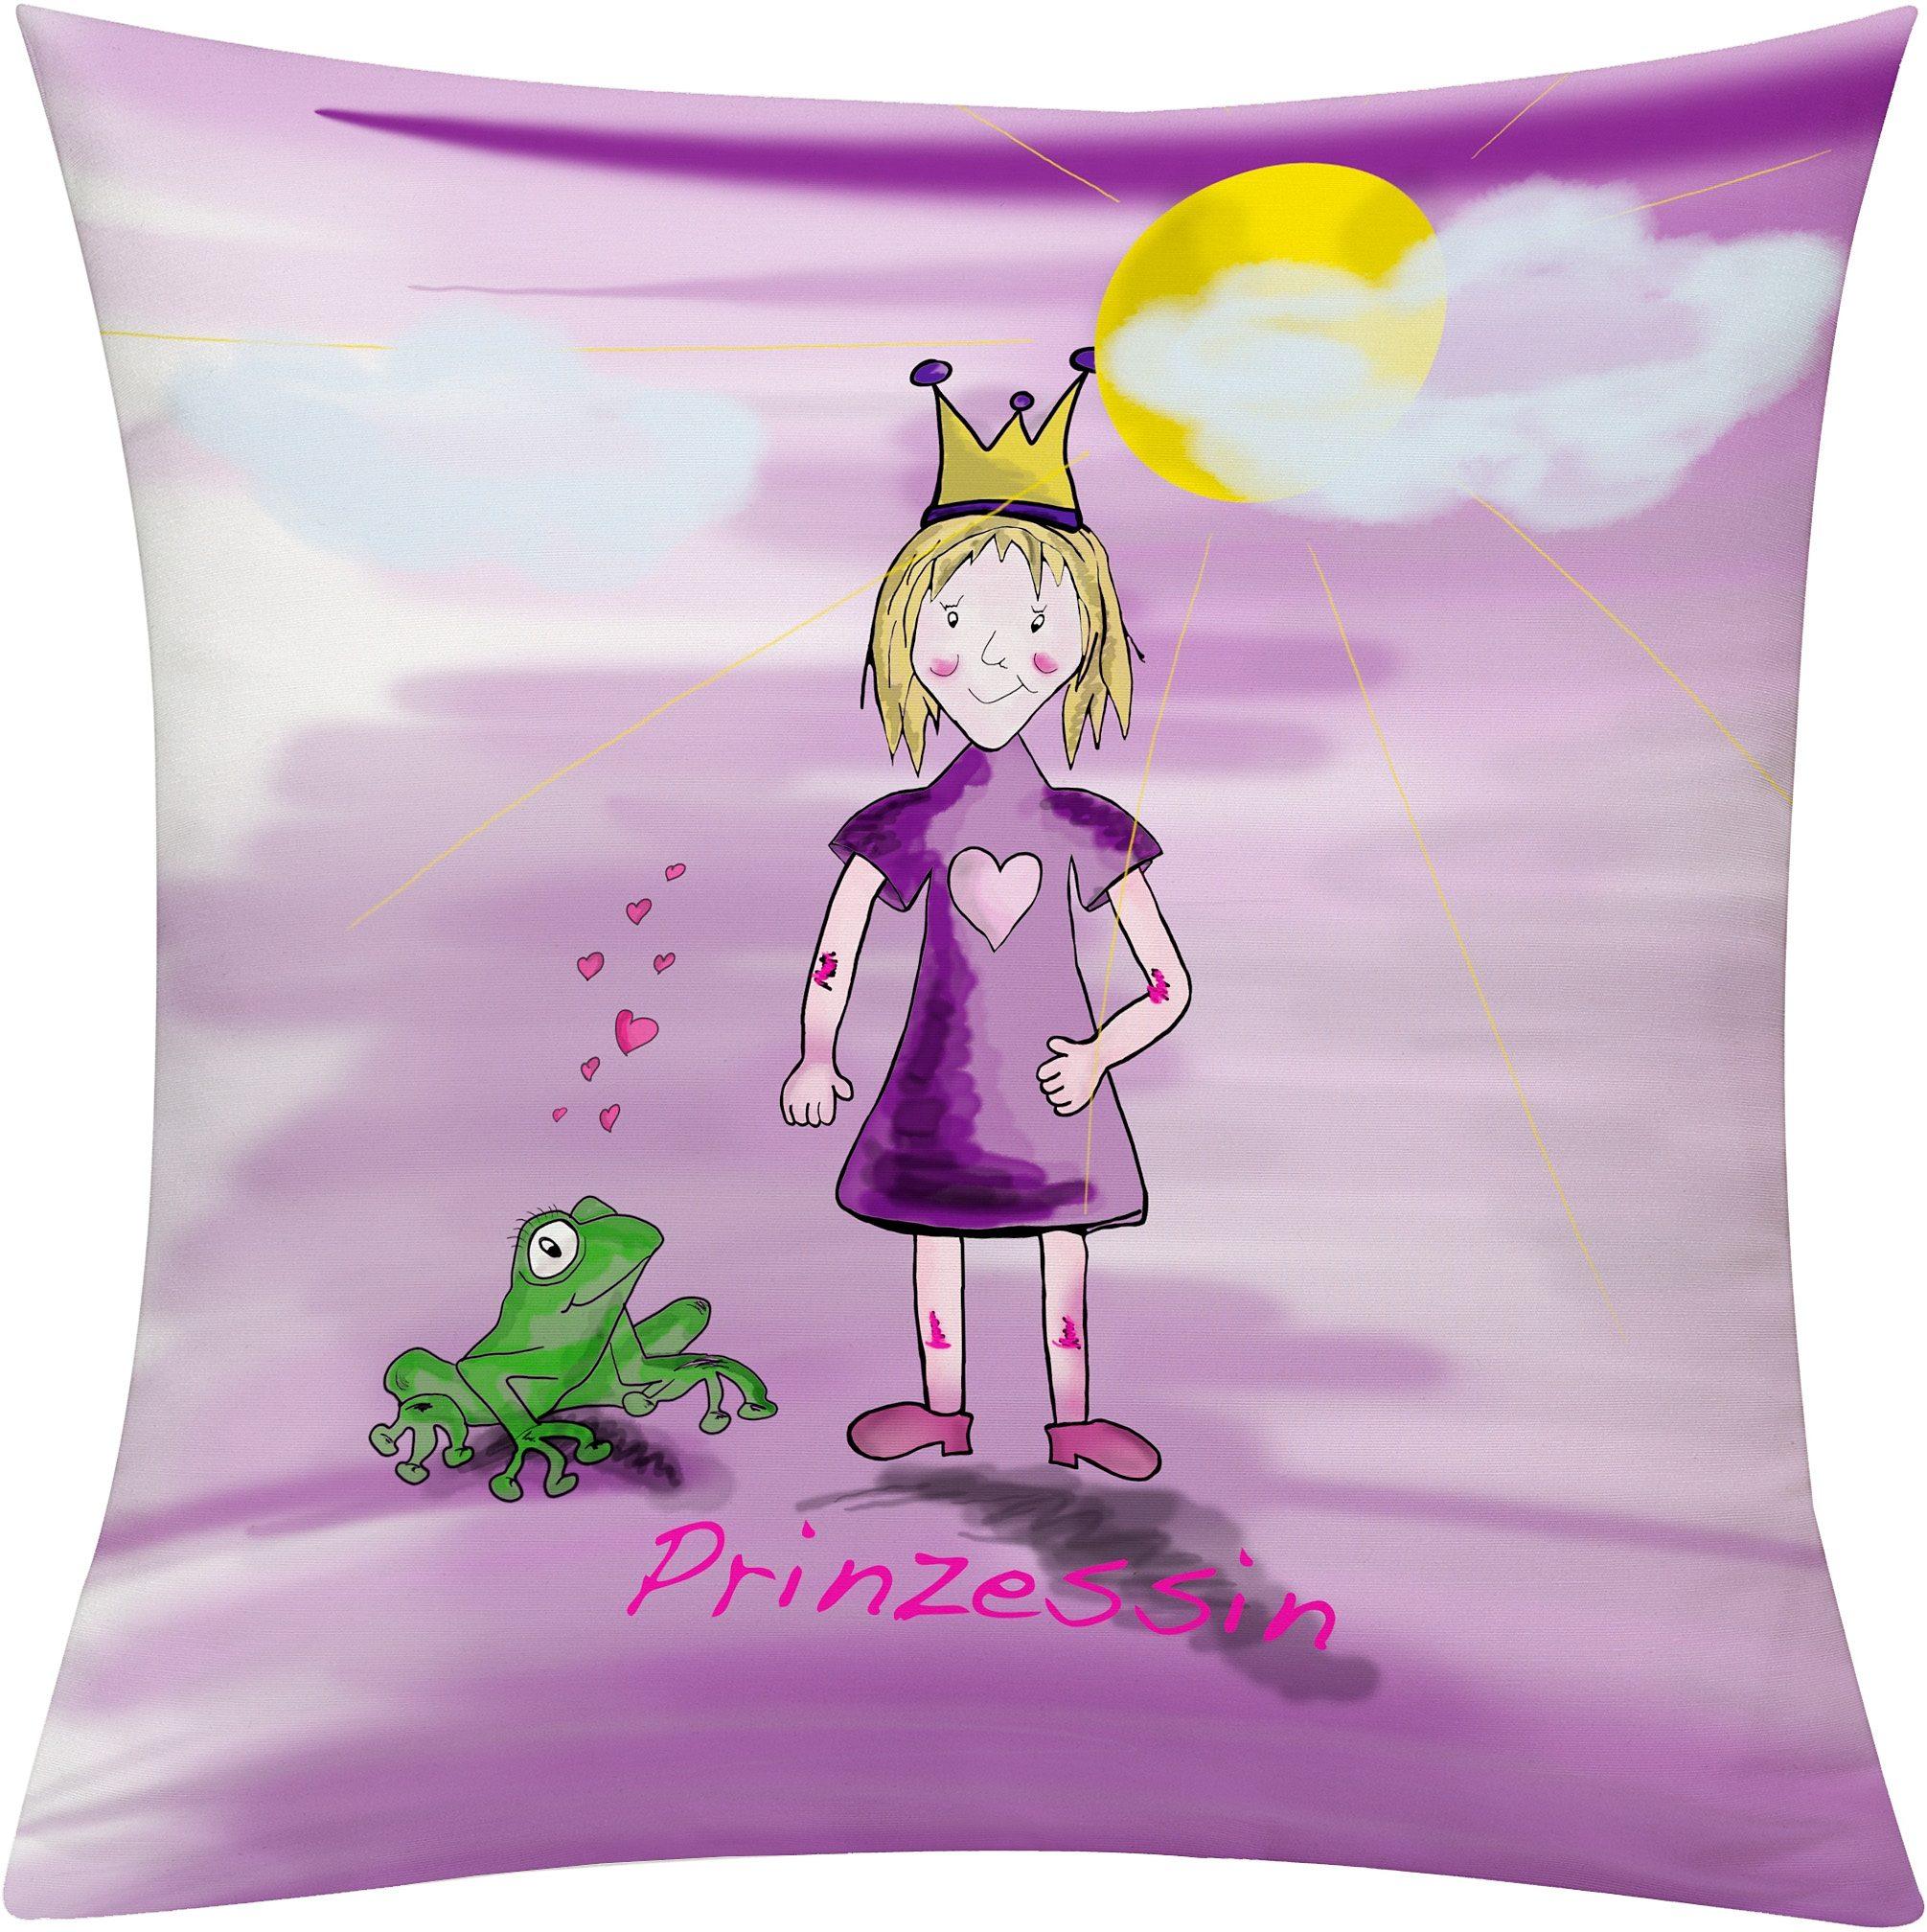 Kissenhülle, Emotiontextiles, »Prinzessin Tag«